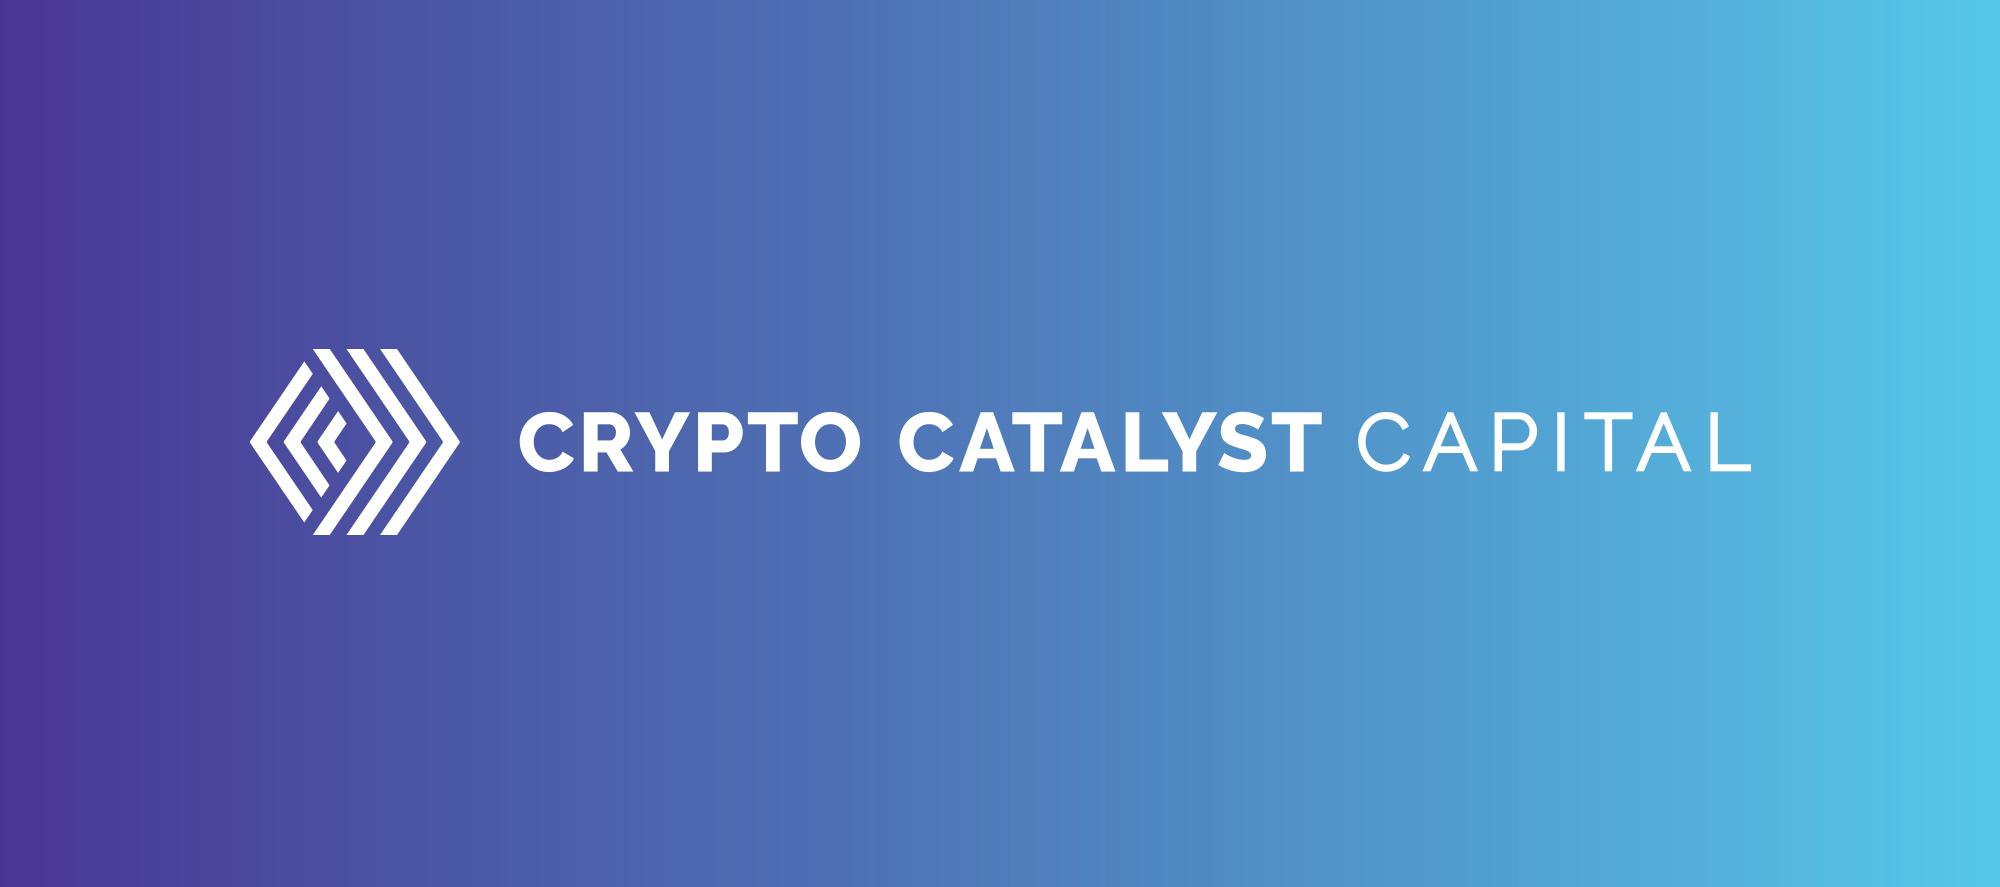 Crypto Catalyst Capital Branding